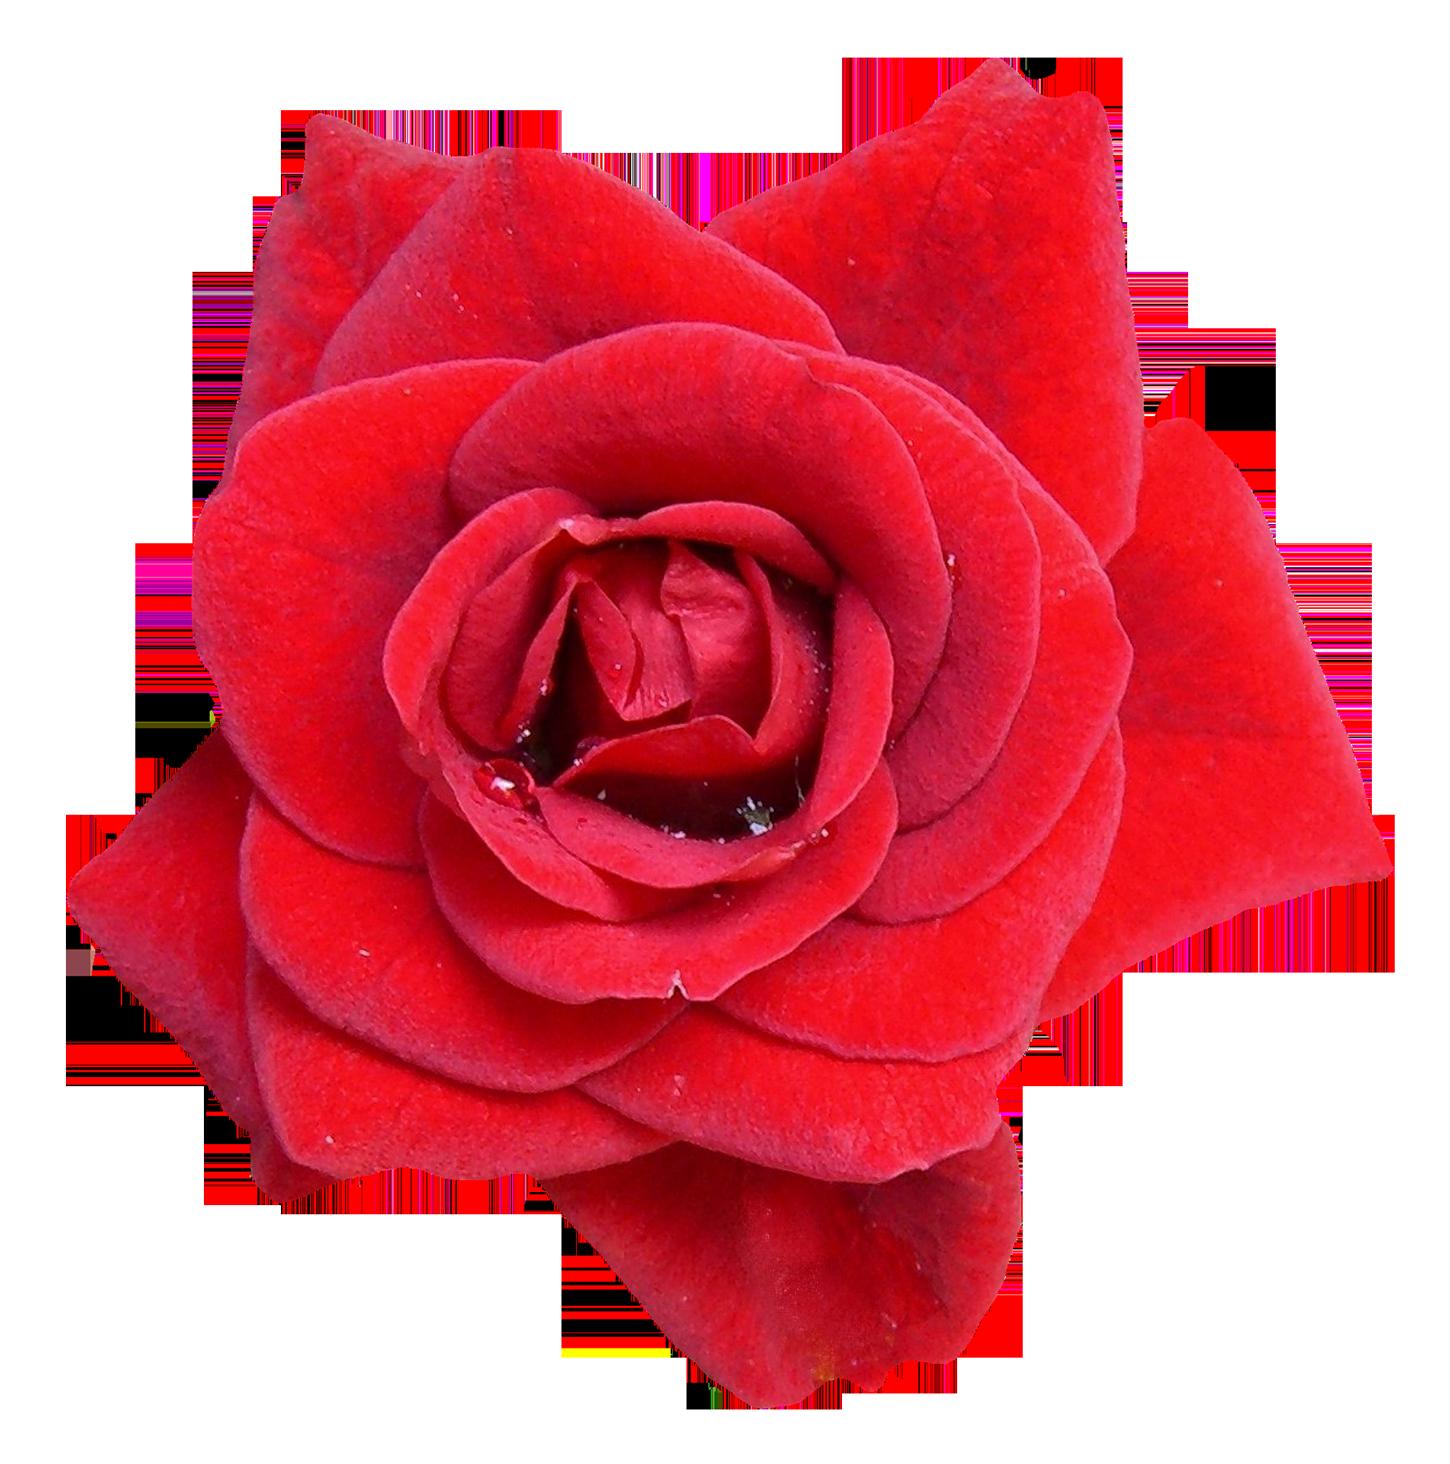 Red Rose Flower Png Image Purepng Free Transparent Cc0 Png Image